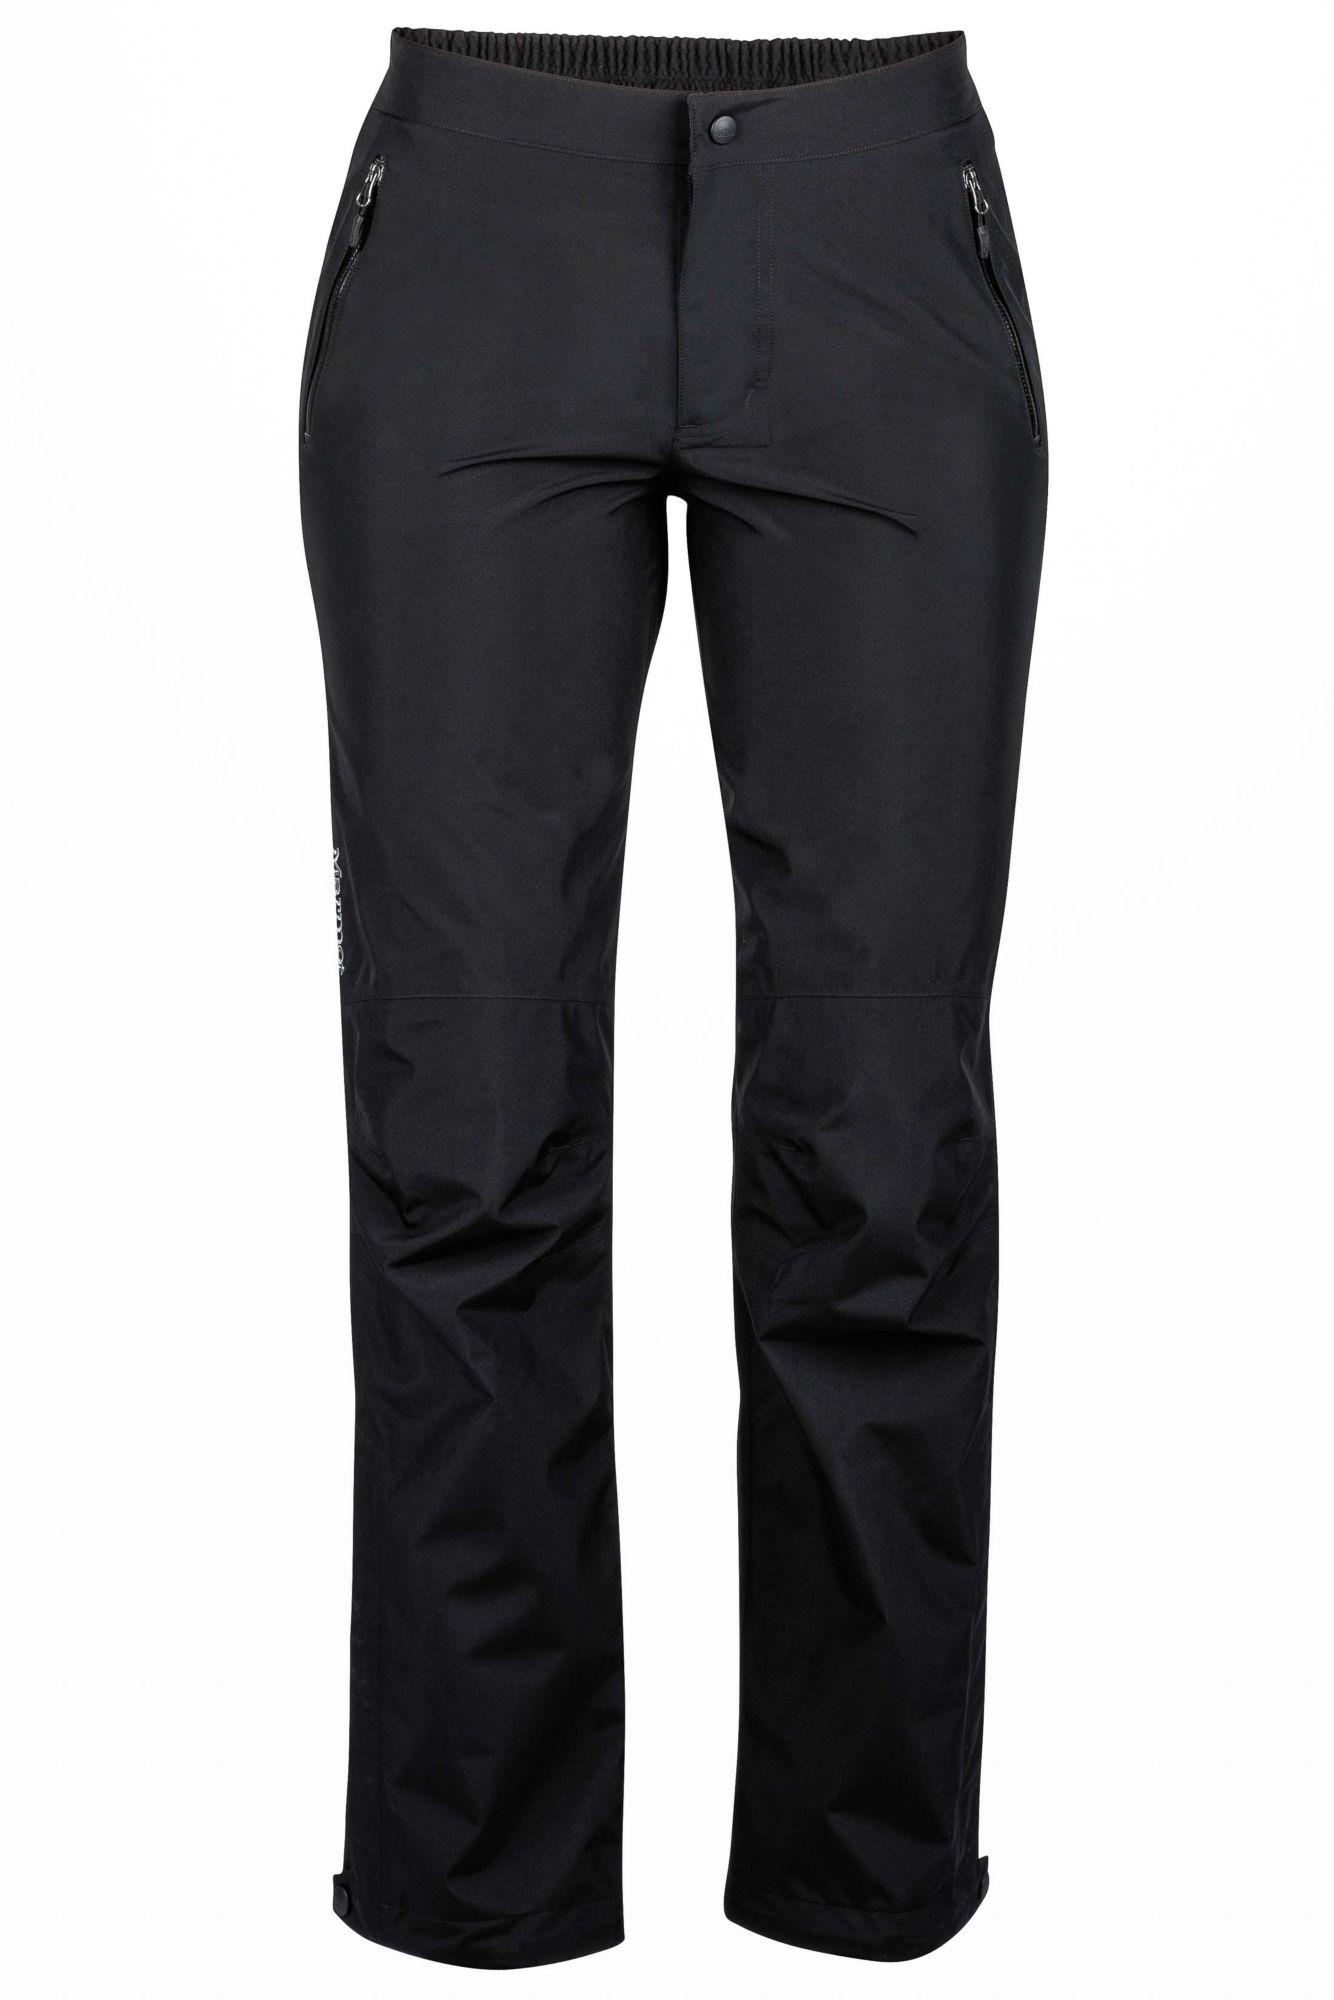 Wm's Minimalist Pant Black